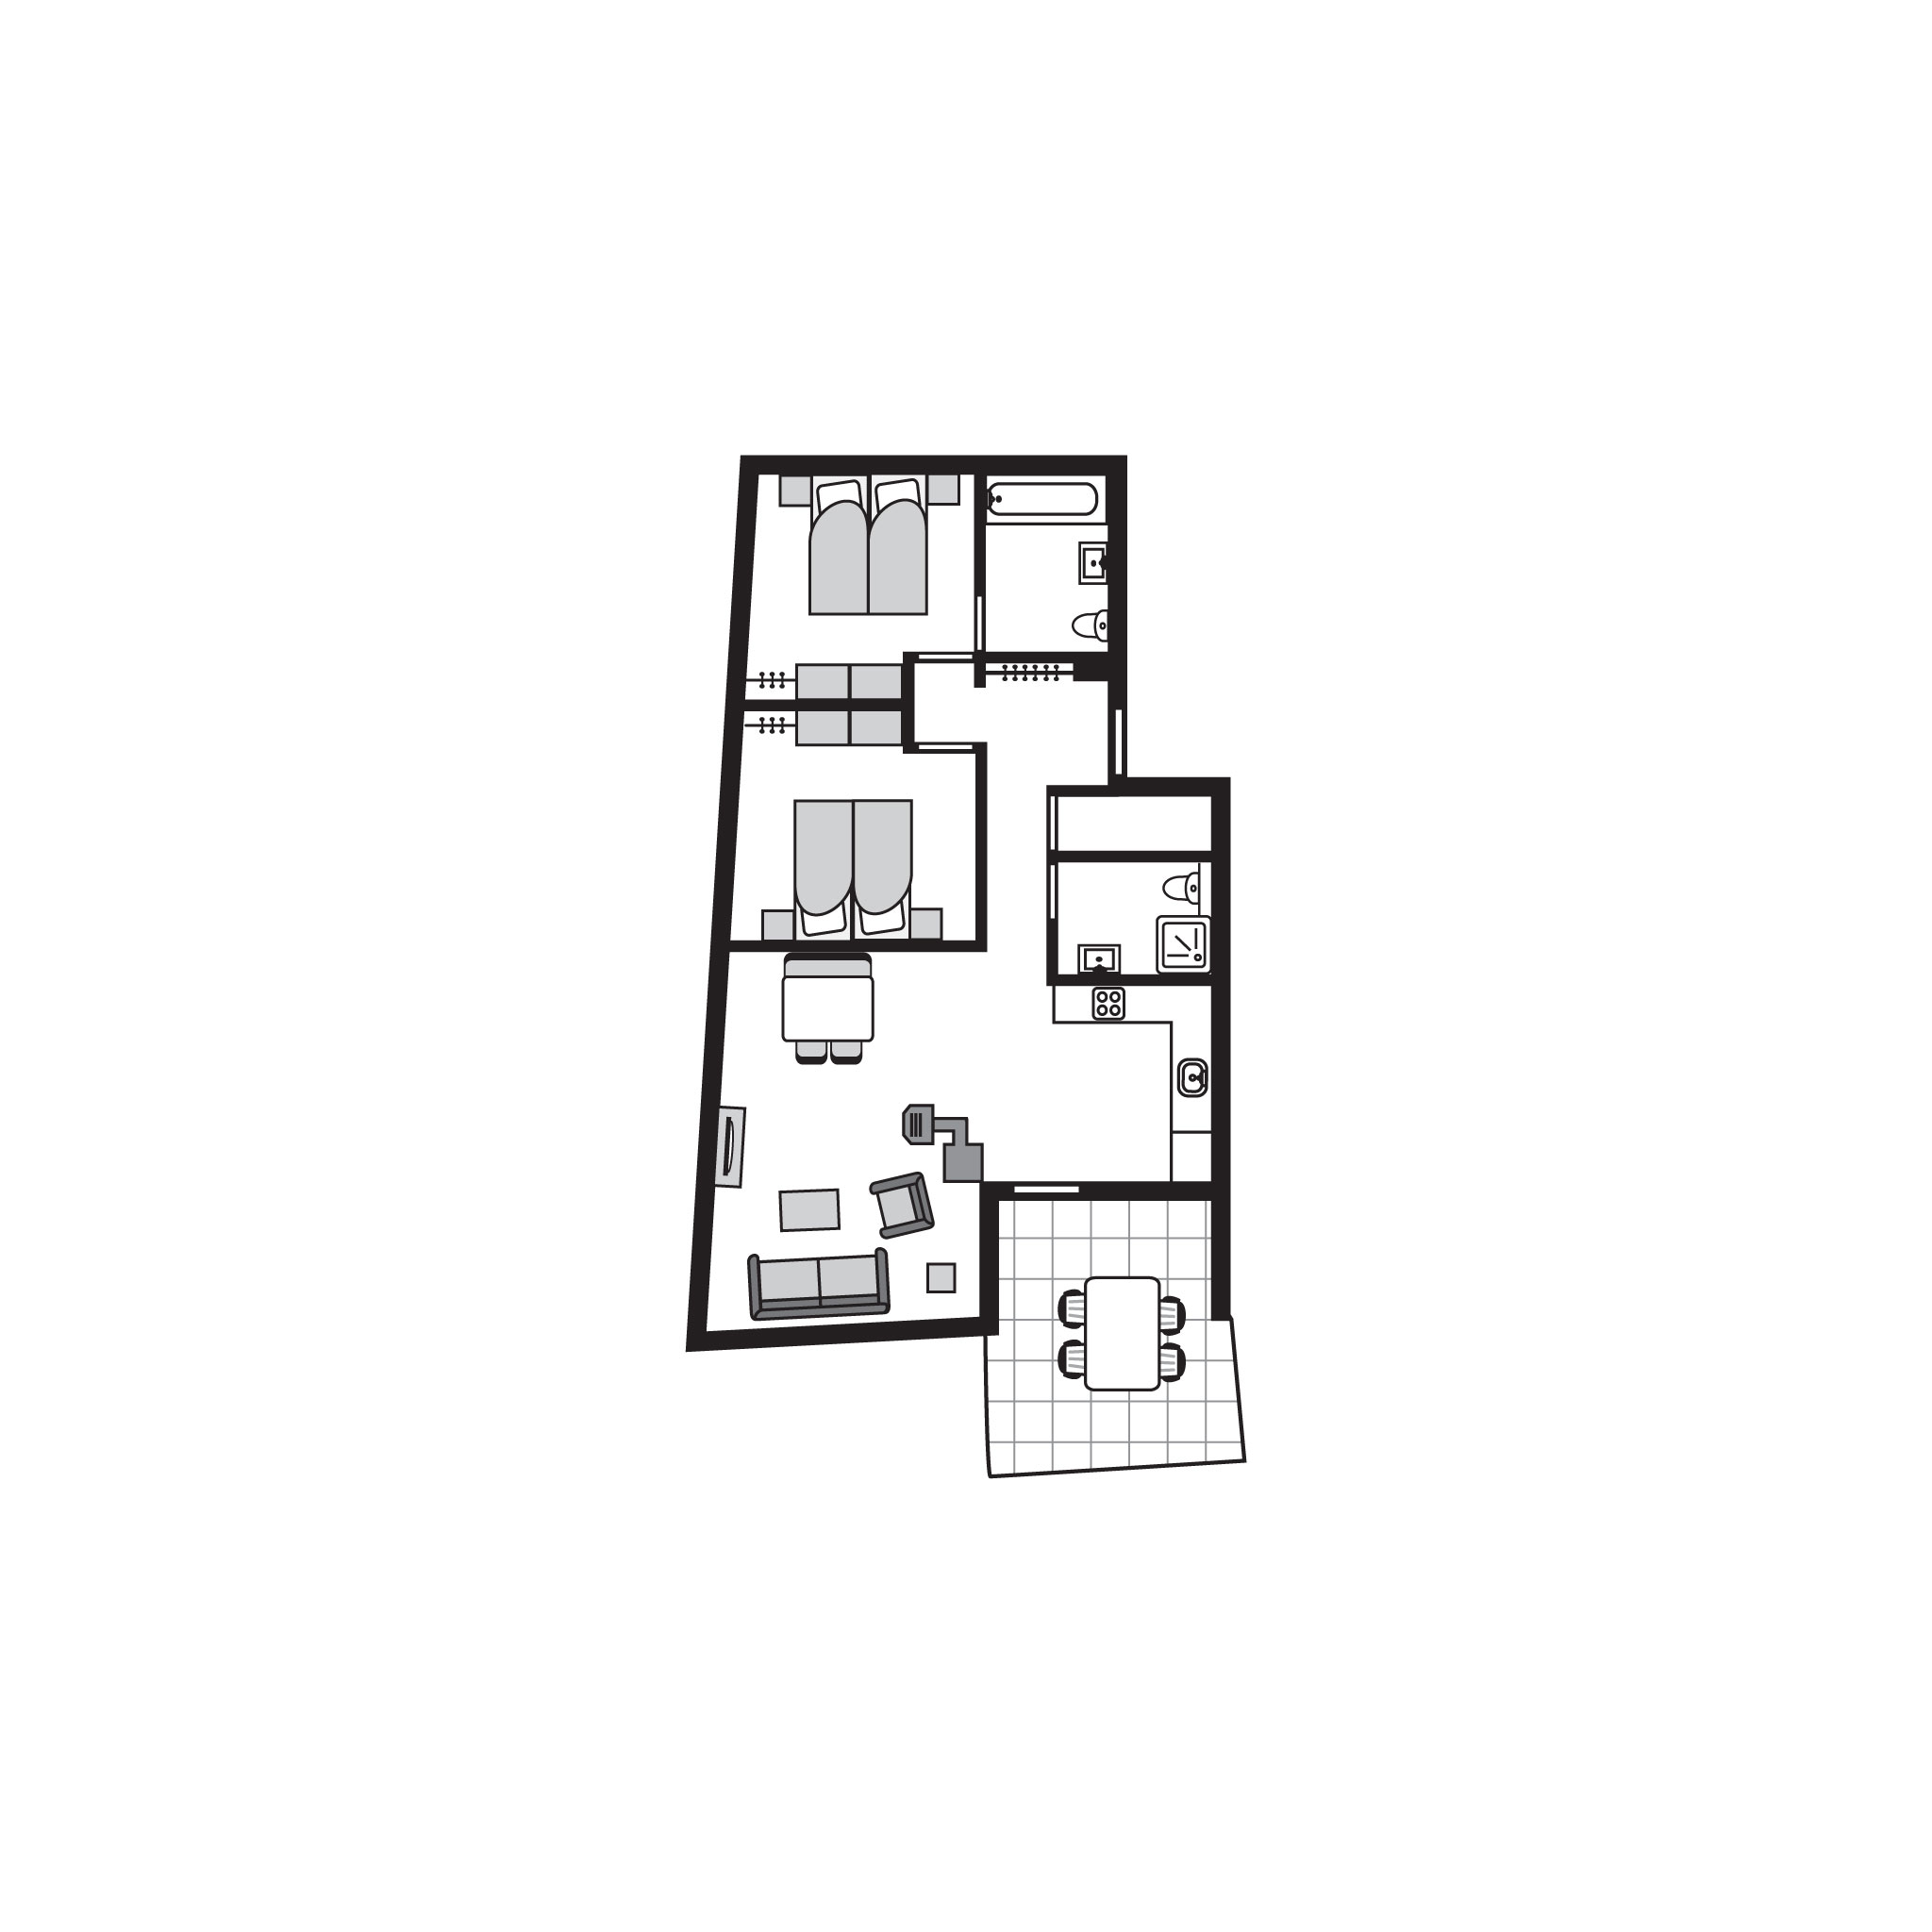 Appartement de vacances Komfort 4-Personen-Ferienwohnung im Ferienpark Landal Alpine Lodge Lenzerheide - in den Be (828234), Lenzerheide/Lai, Lenzerheide - Valbella, Grisons, Suisse, image 40